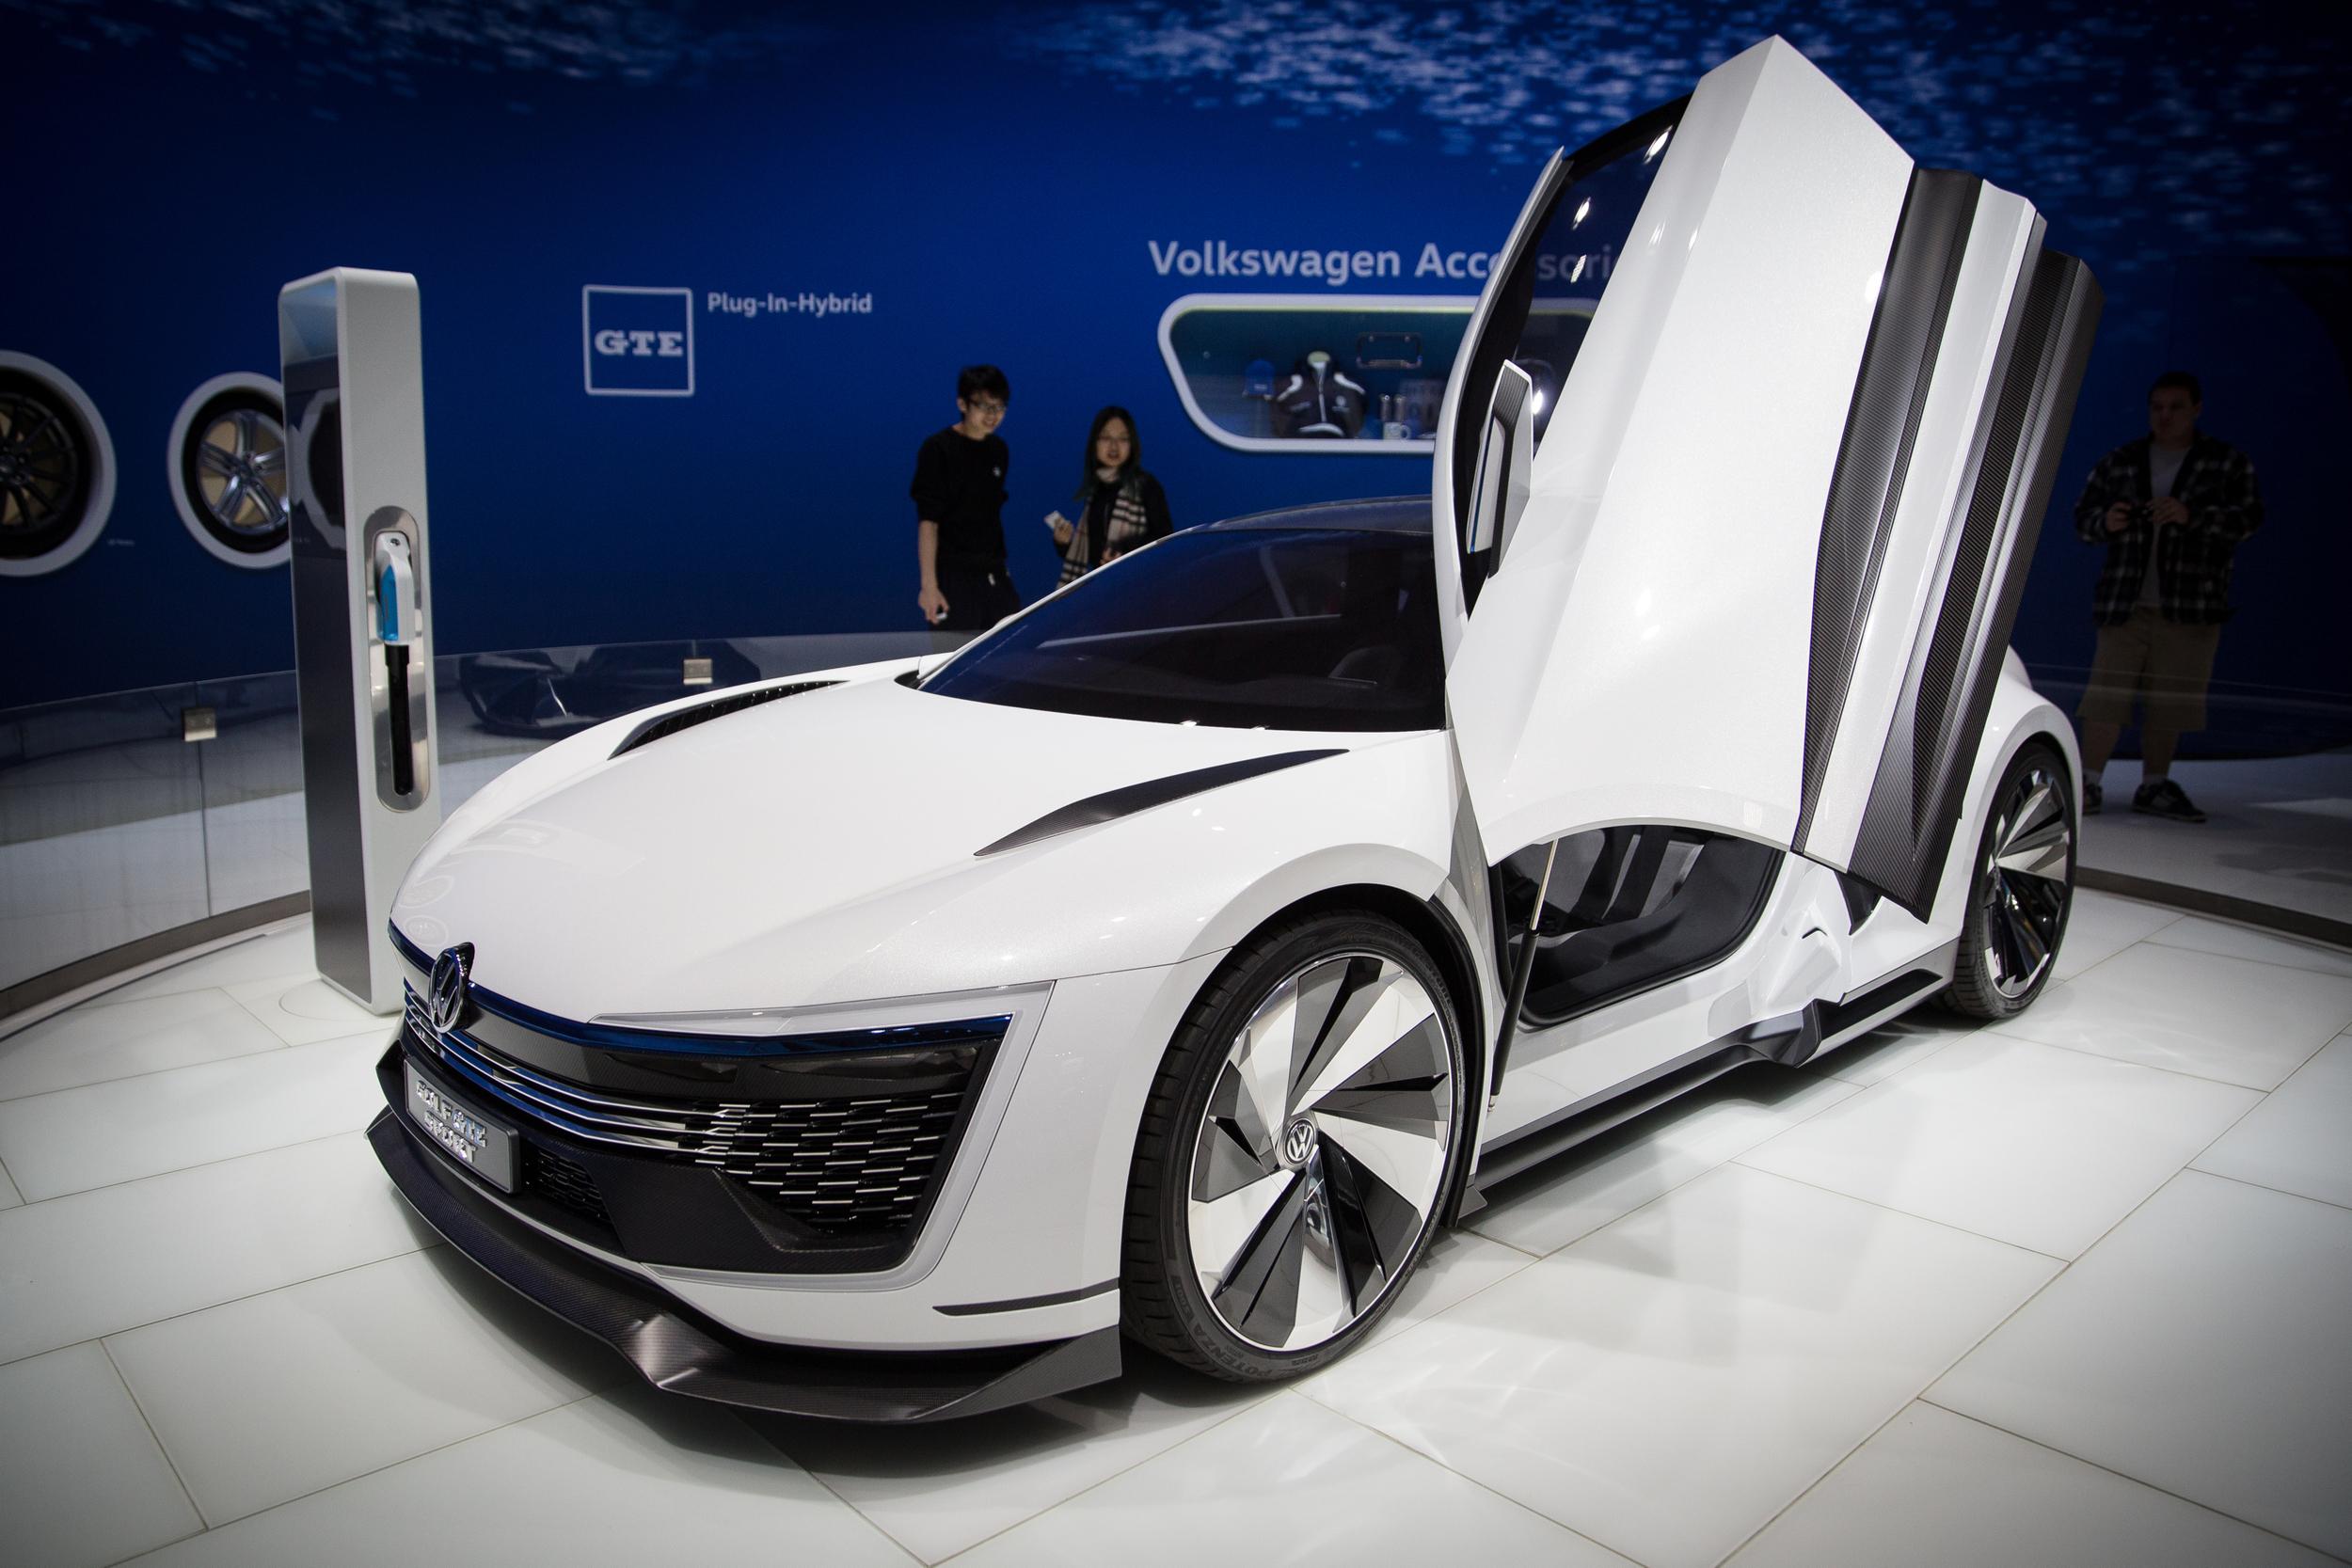 Volkswagen Concept Supercar - 2015 LA Auto Show